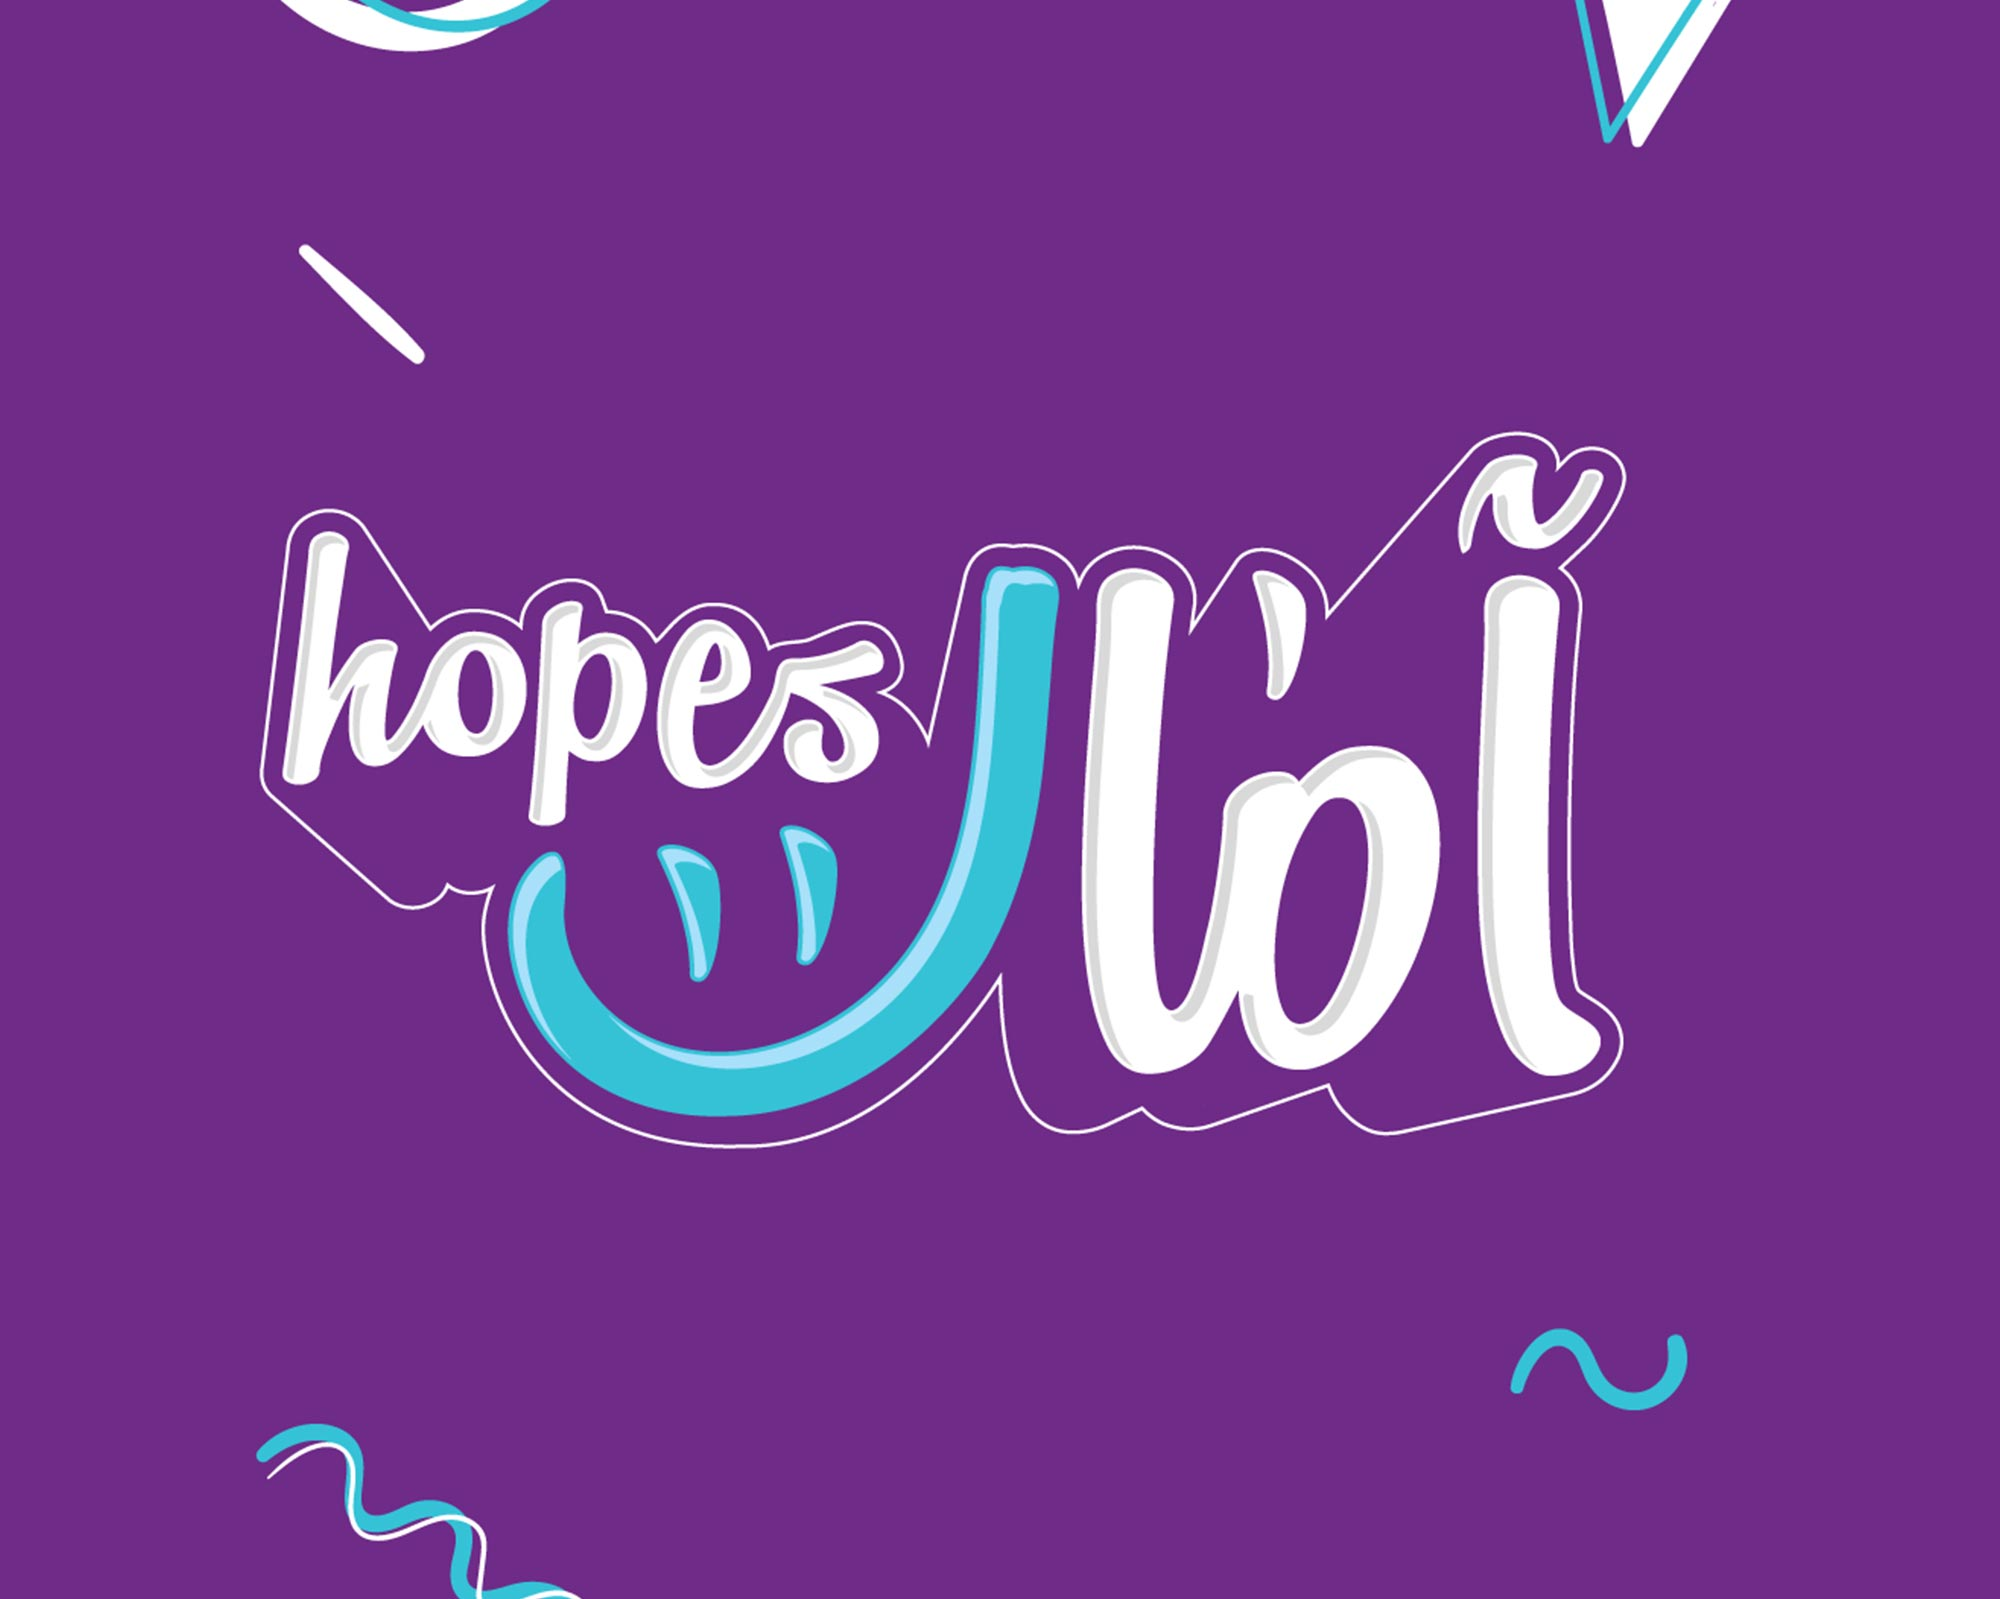 Hopes - آمال